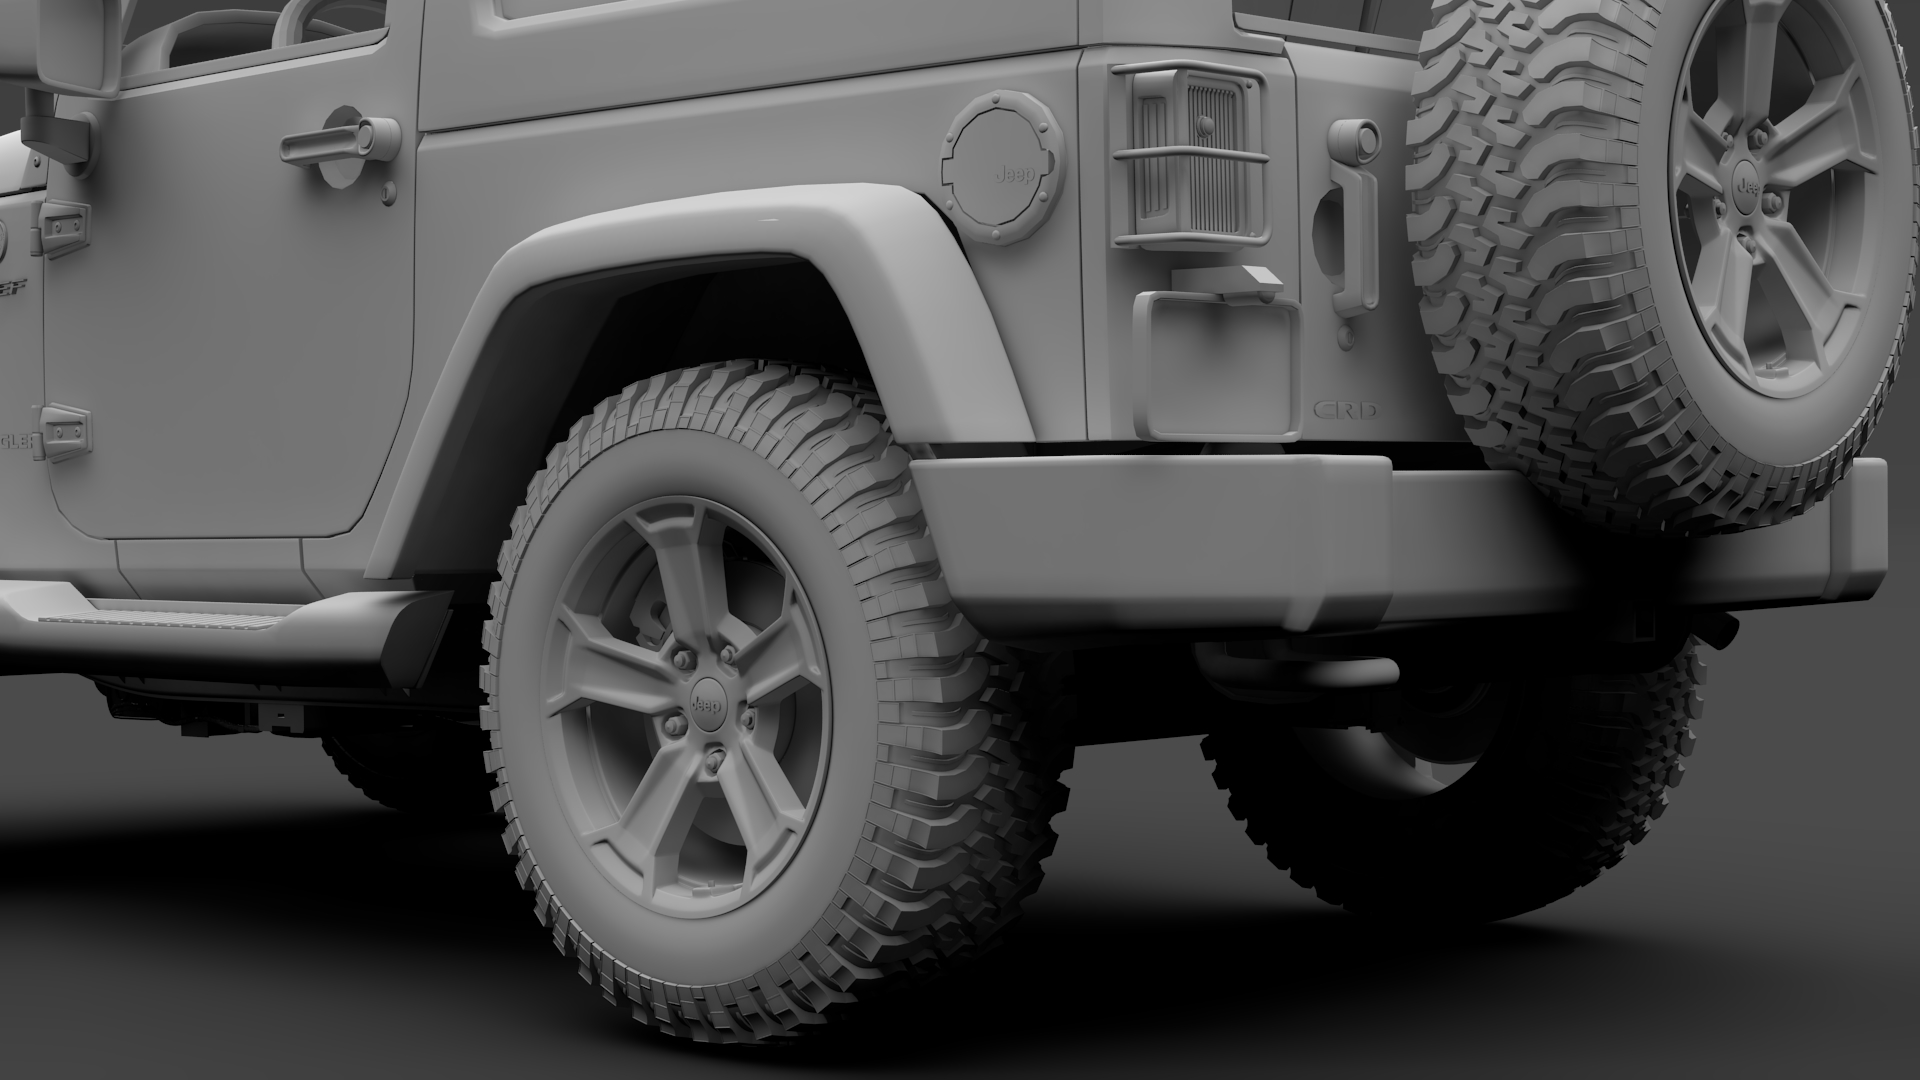 jeep wrangler chief jk 2017 3d model max fbx c4d lwo ma mb hrc xsi obj 276894